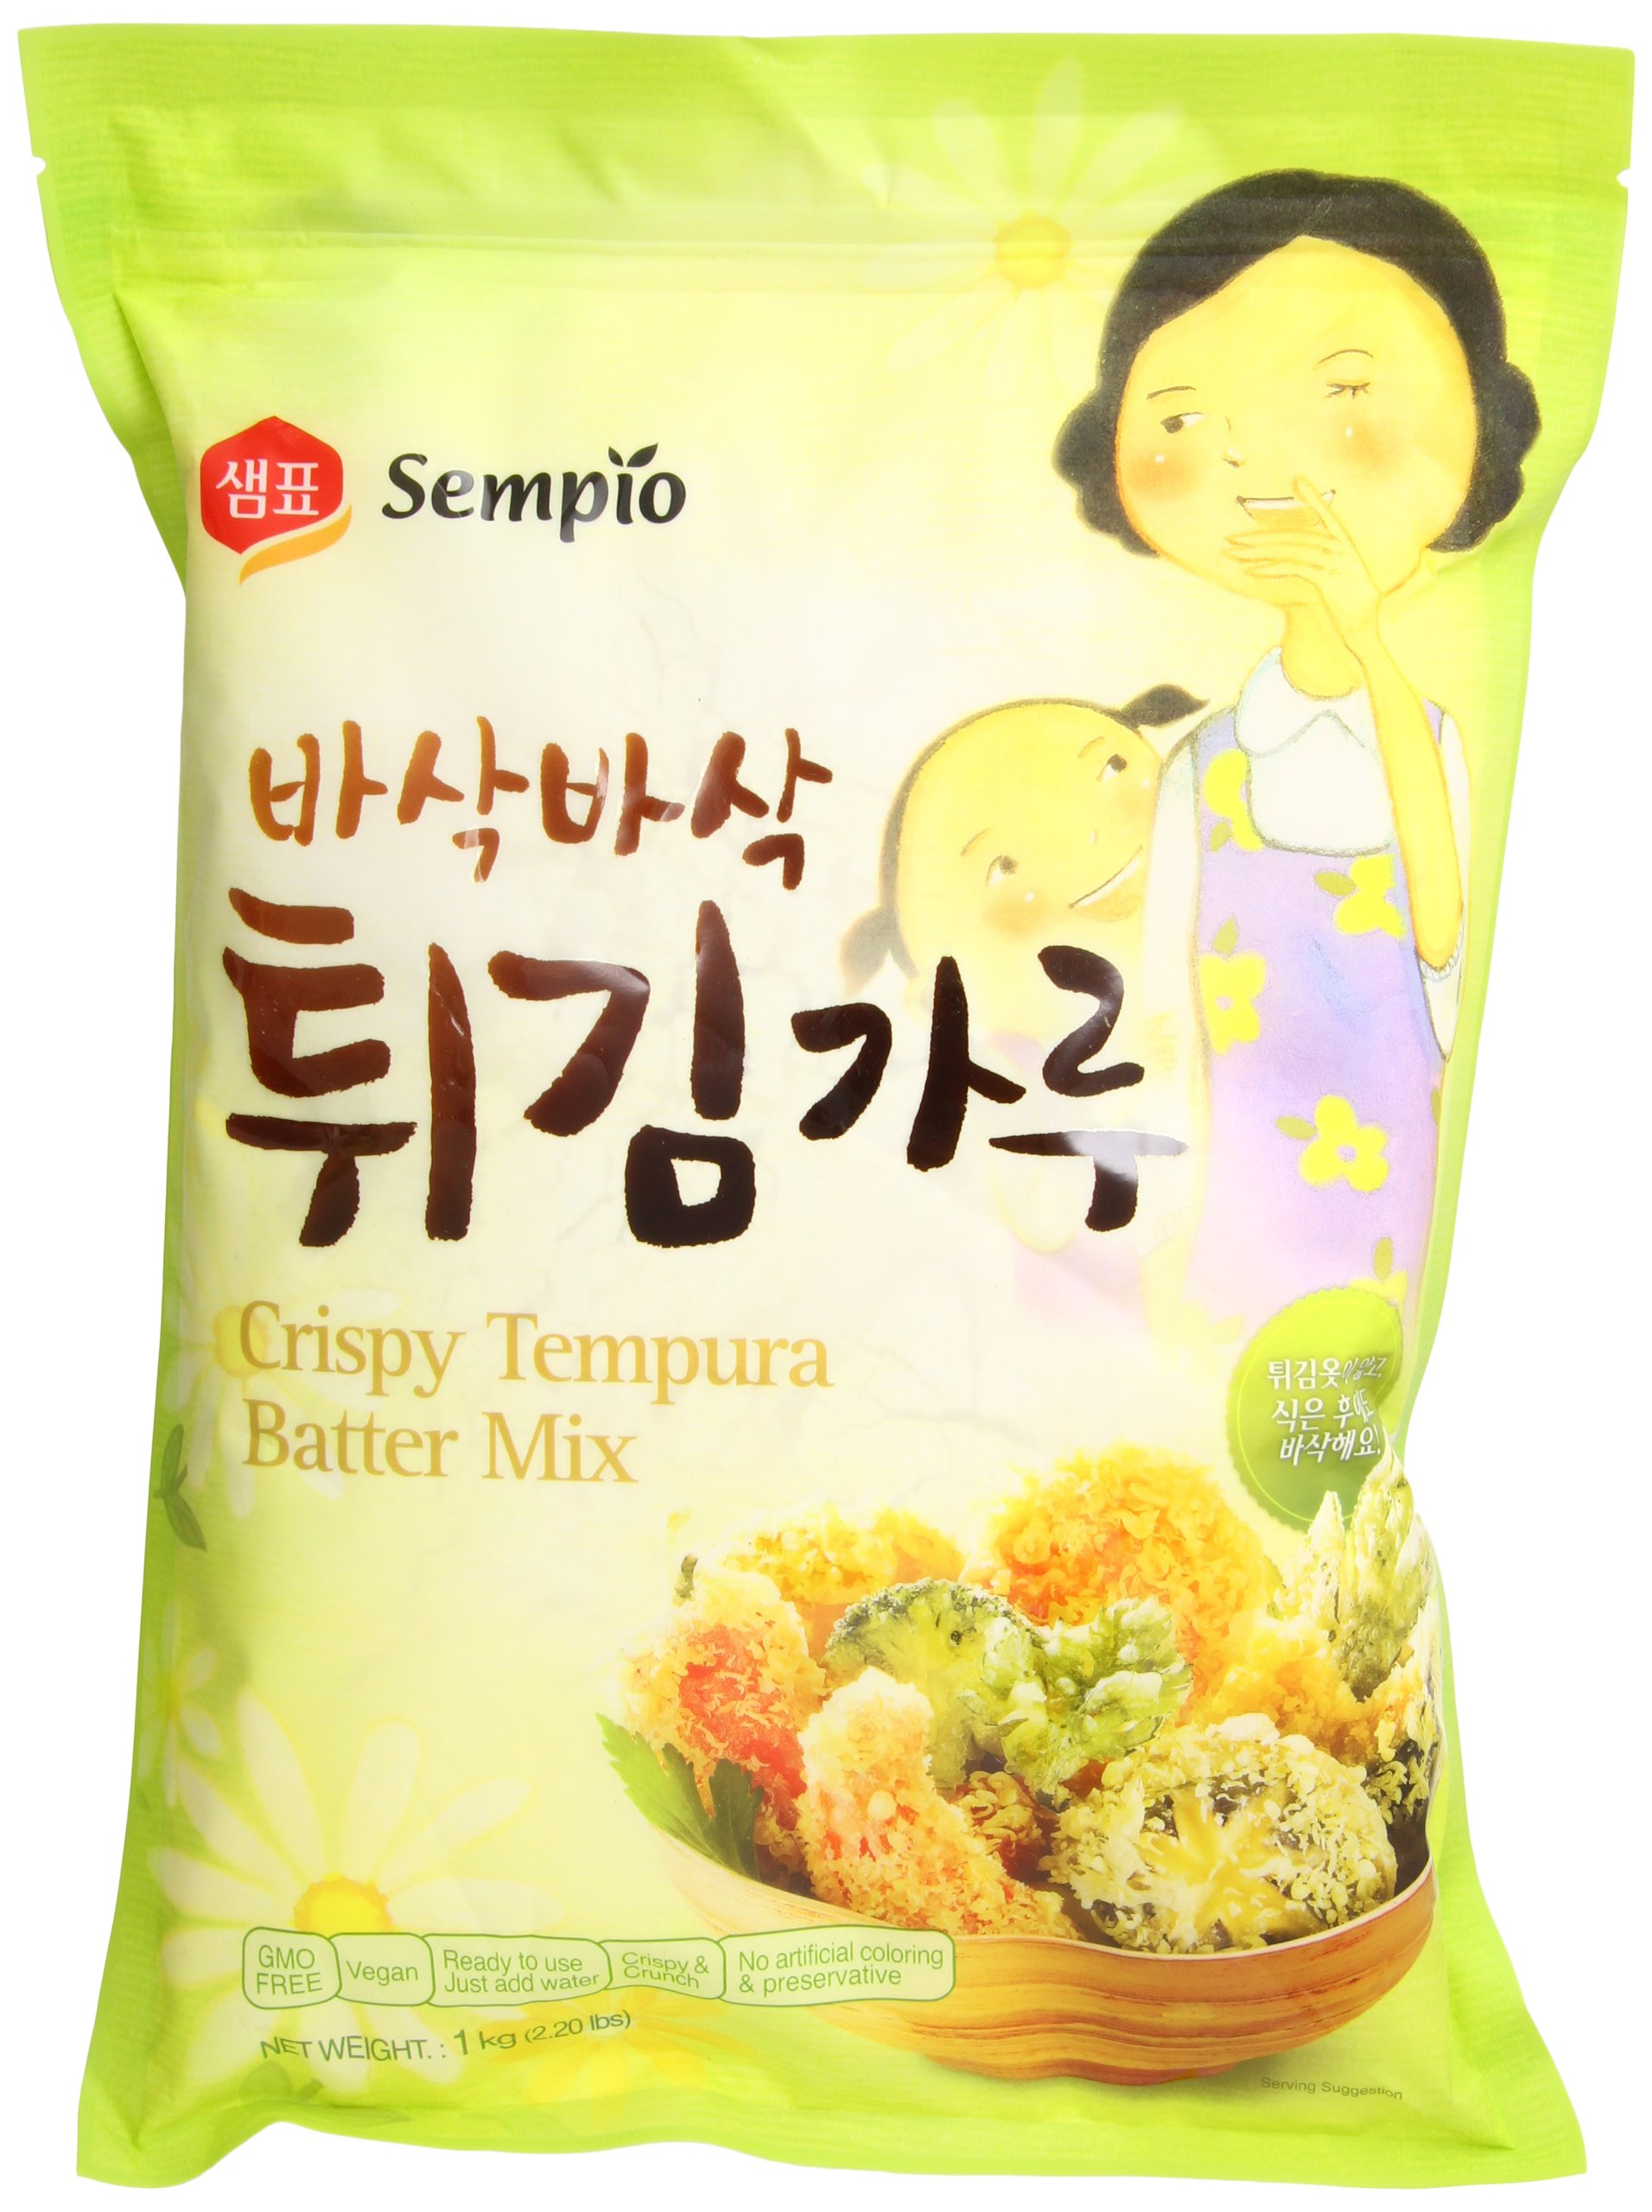 Sempio Crispy Tempura Batter Mix, 2.2 Pound (Pack of 10)